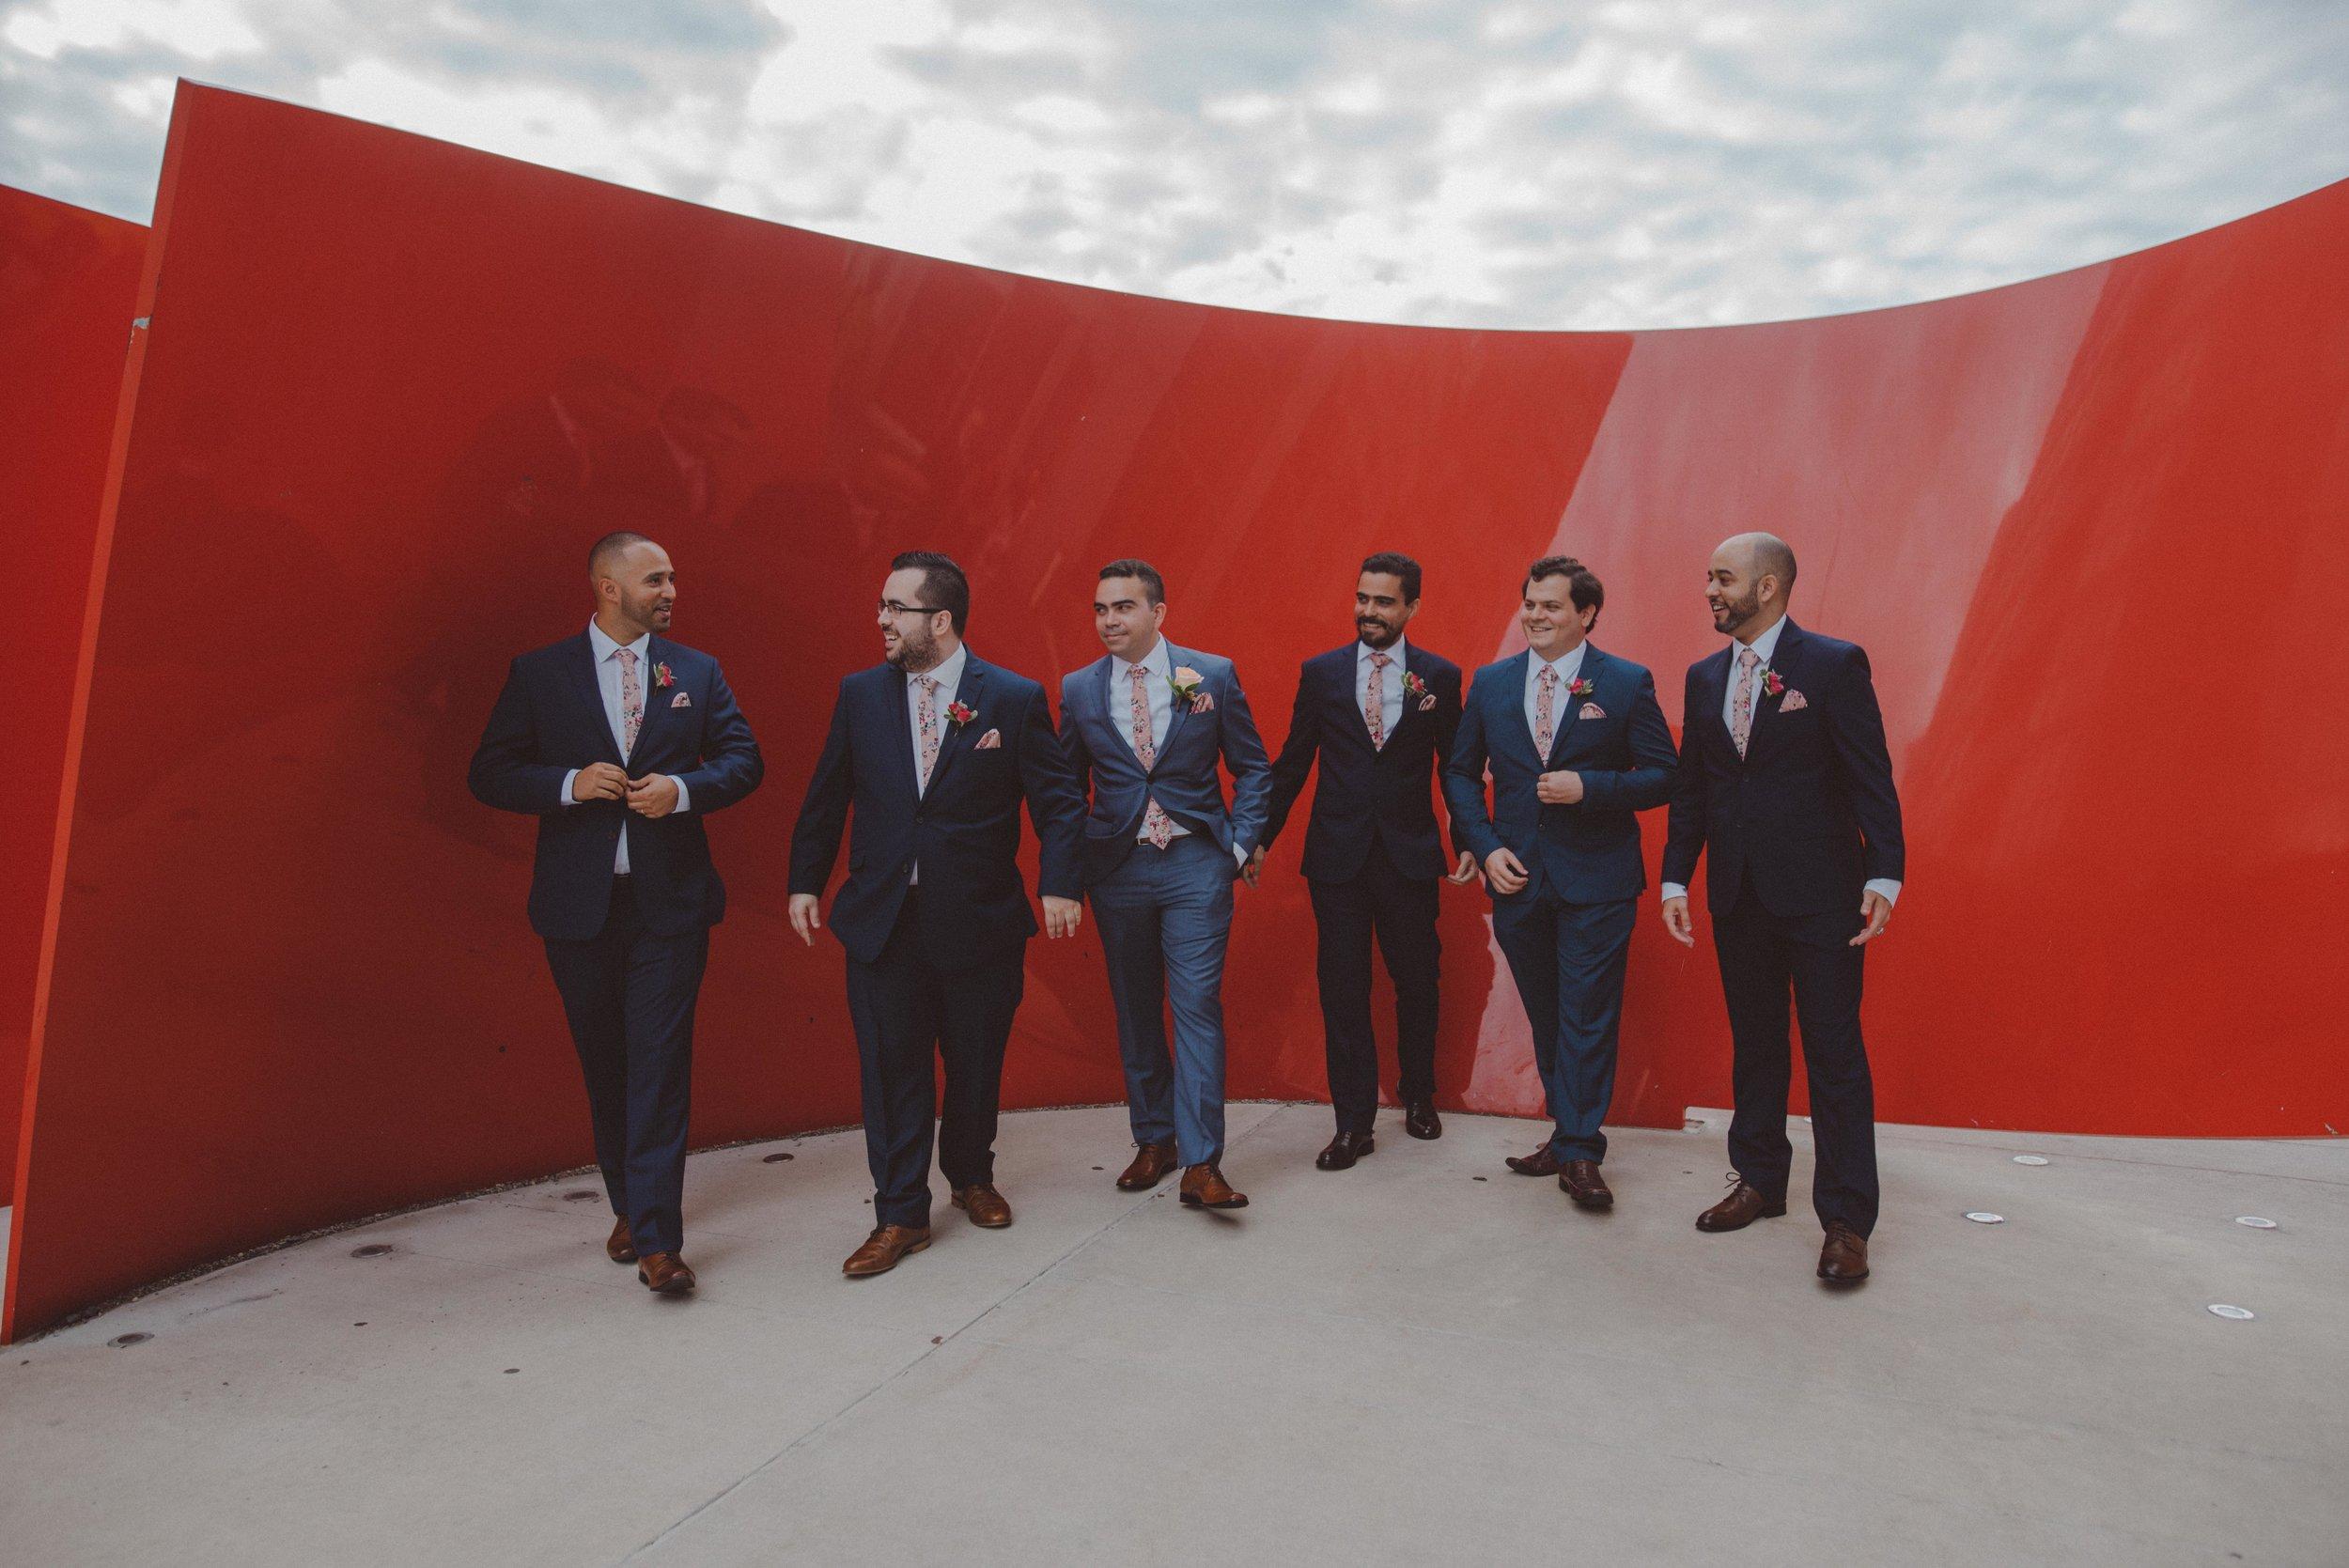 mariage_photographe_toronto_gatineau_ottawa_photographer_wedding-45.jpg